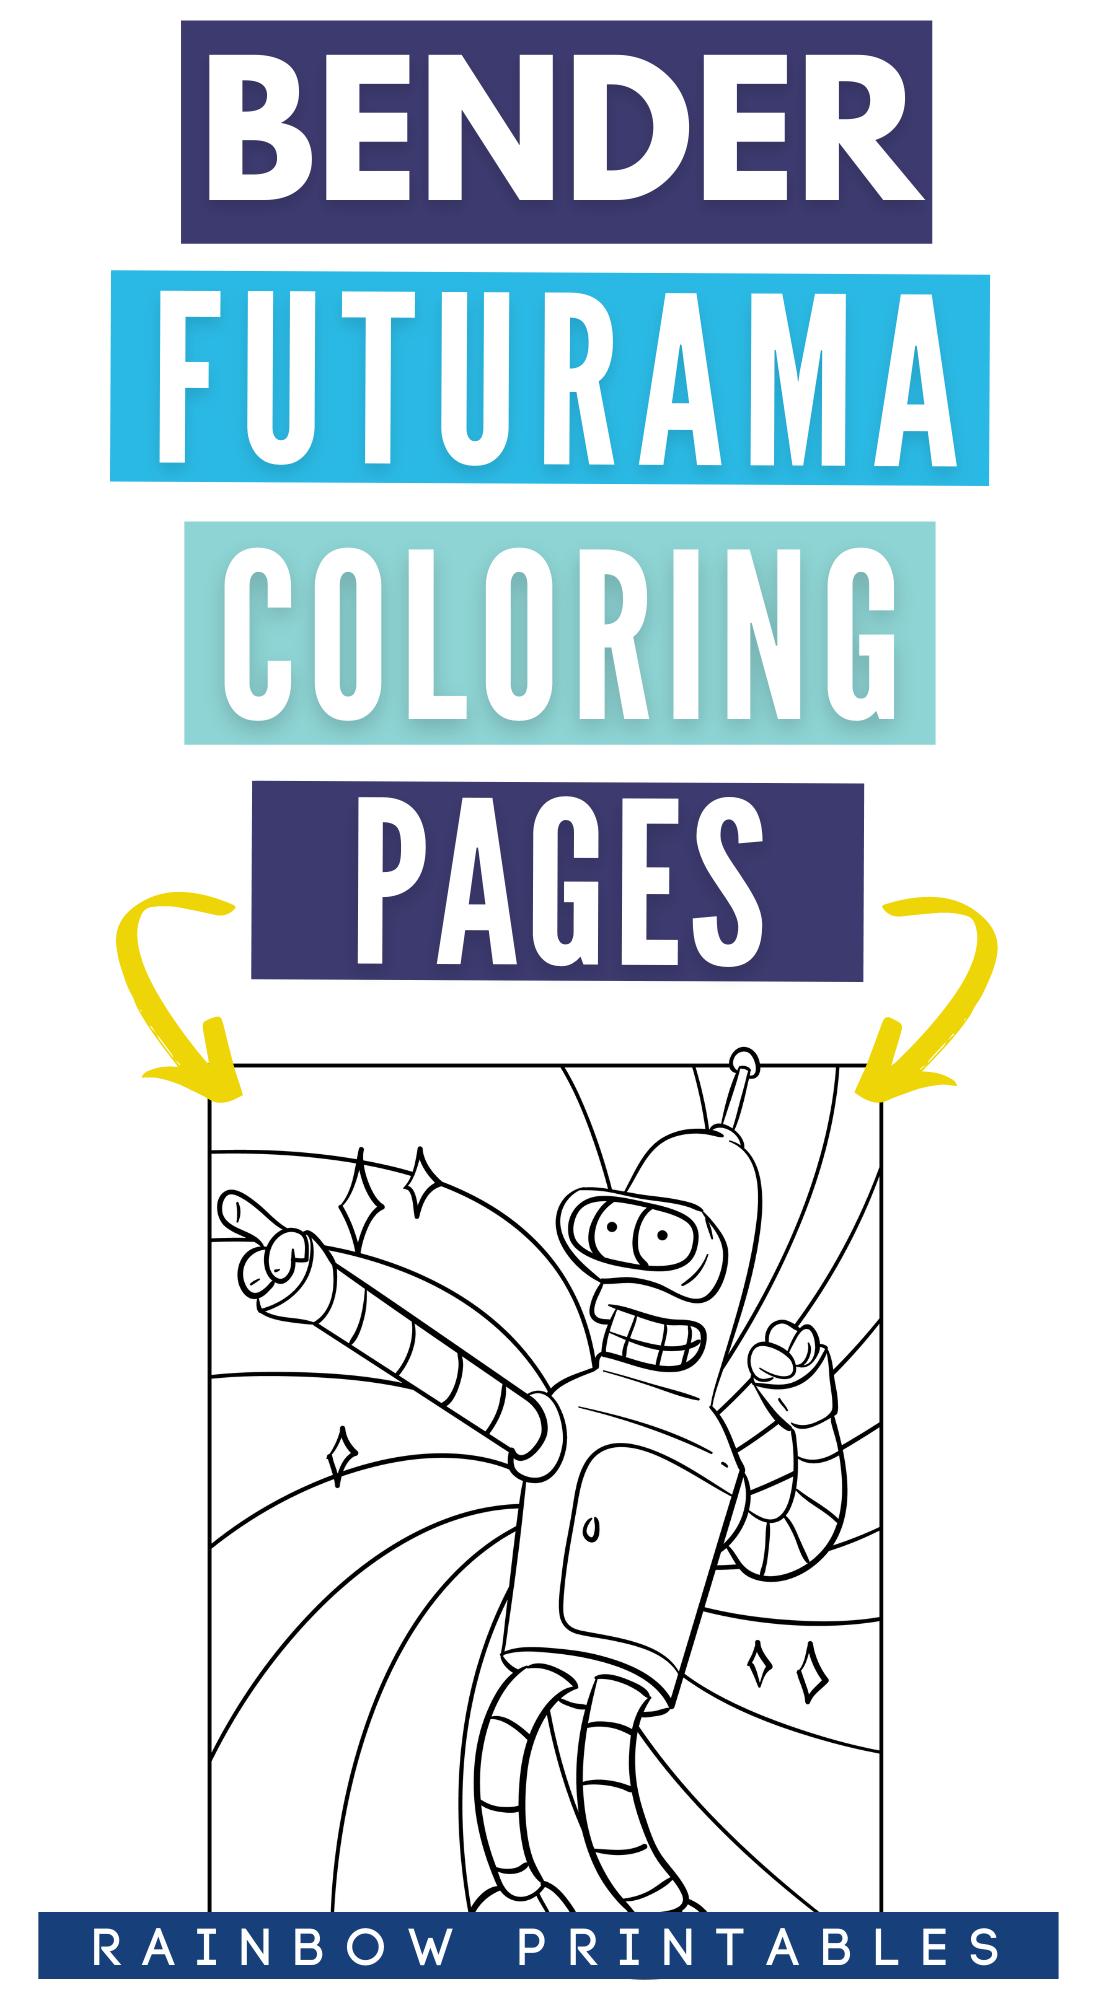 Funny Bender Rodriguez (Futurama) Cartoon Coloring Pages – Robot Coloring Sheet